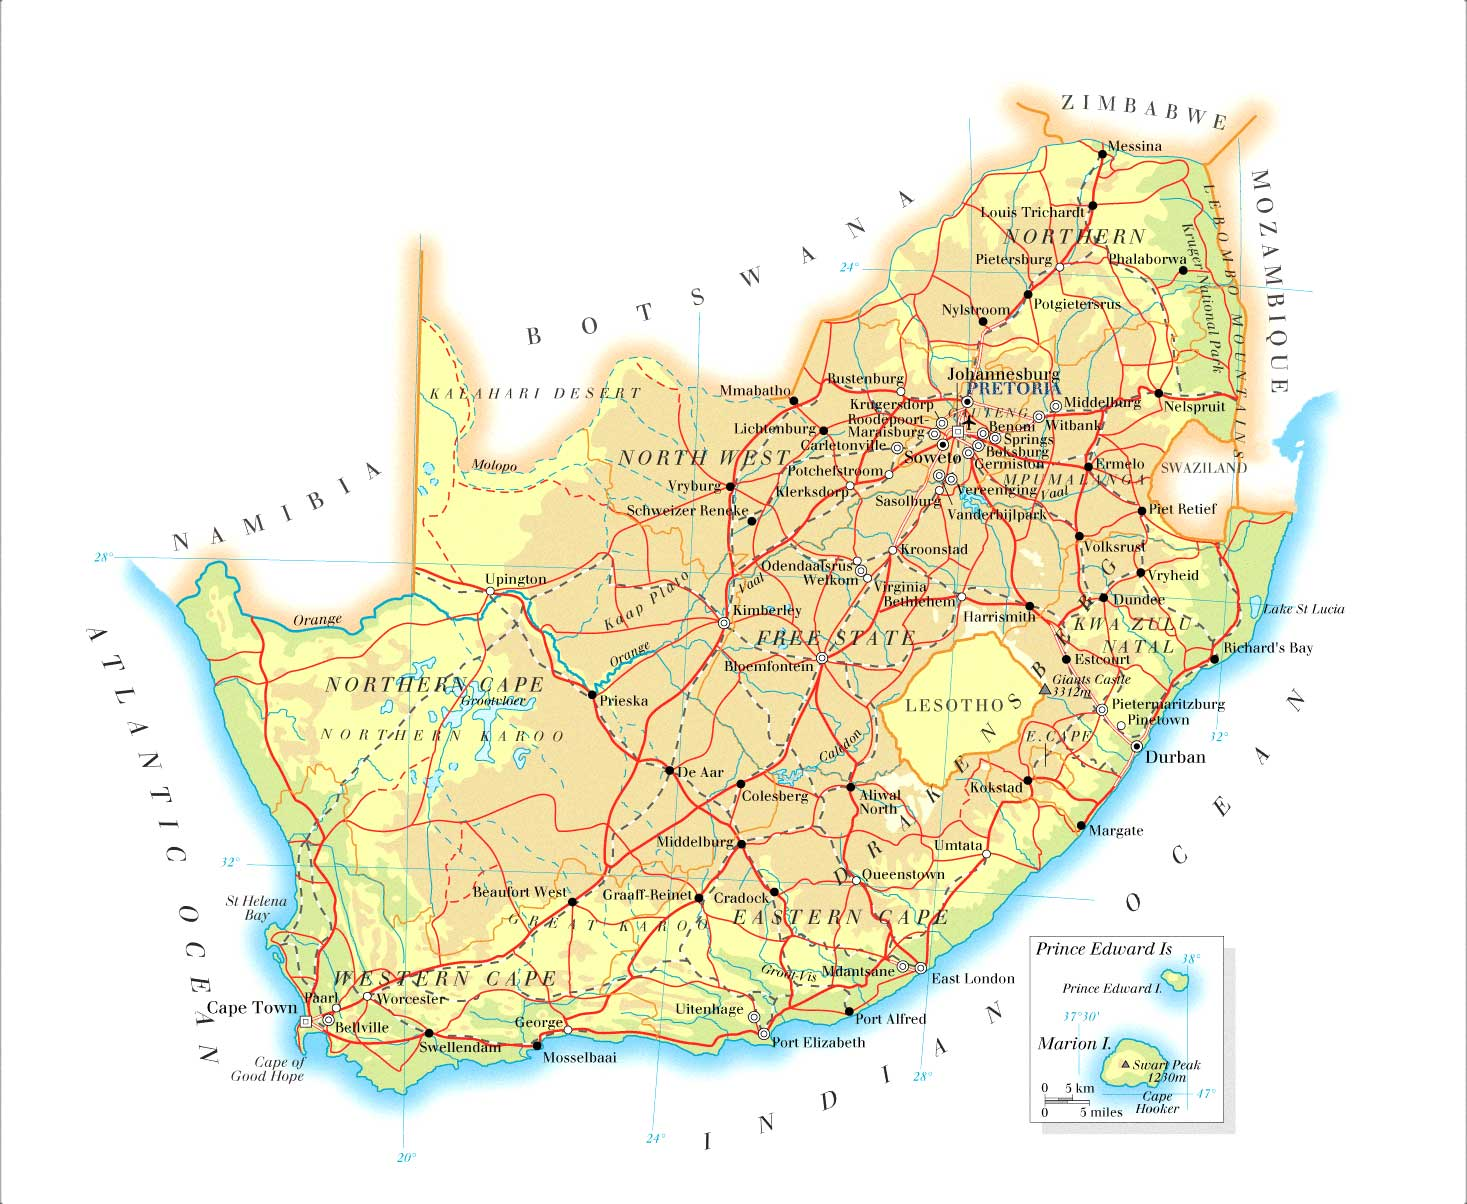 Index of countryafricasouthafricamaps